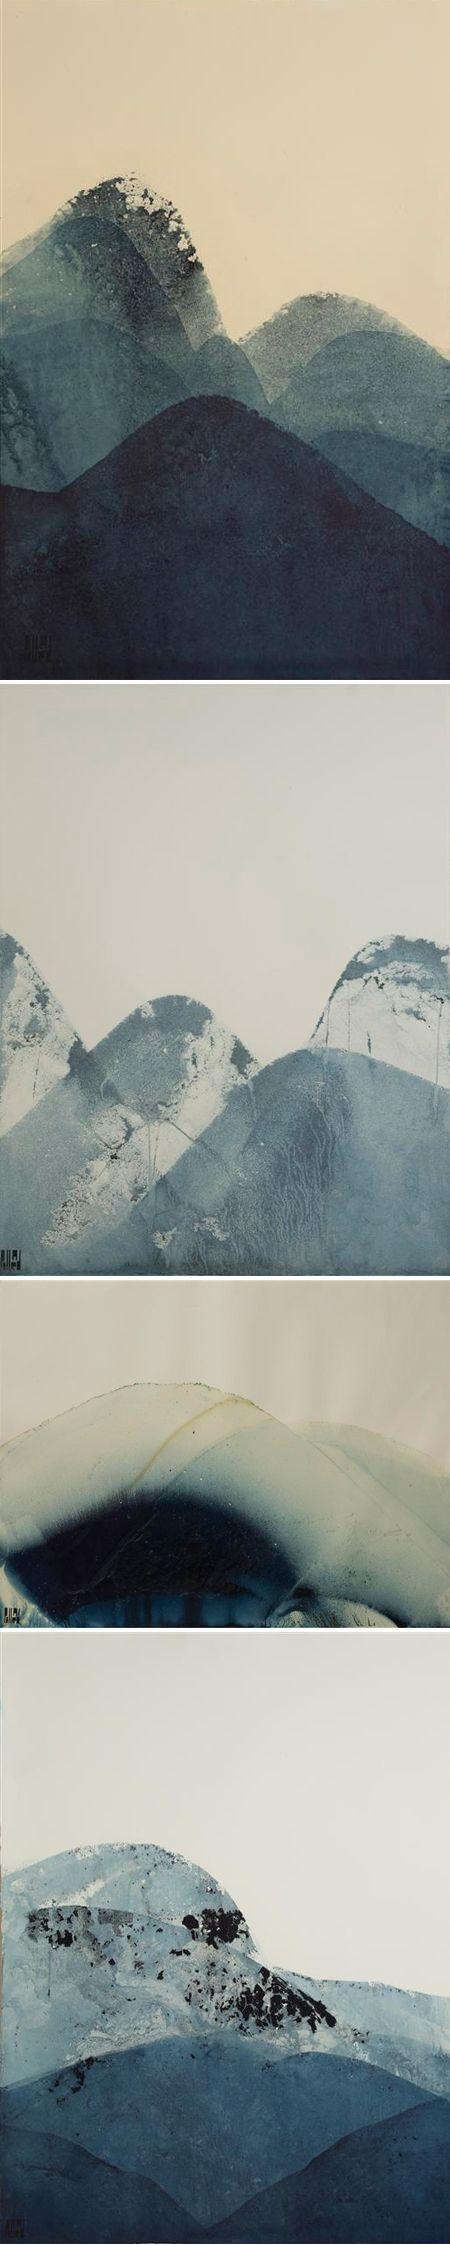 Lynn Pollard - she makes these by dipping bent paper into indigo dye vats